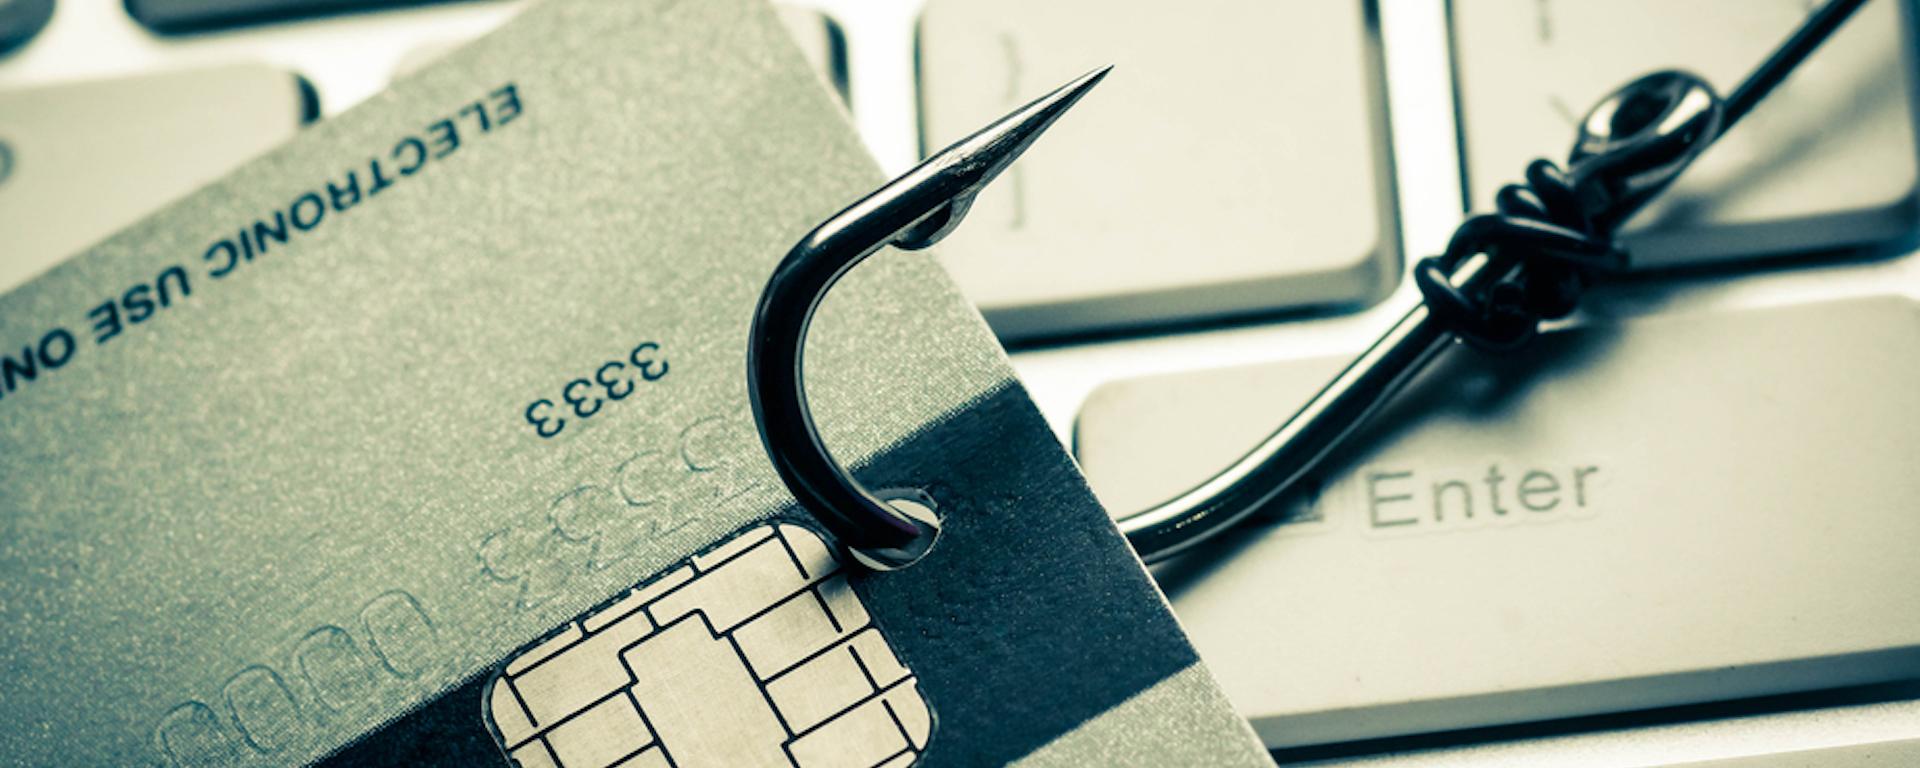 Spear-phishing-attacks